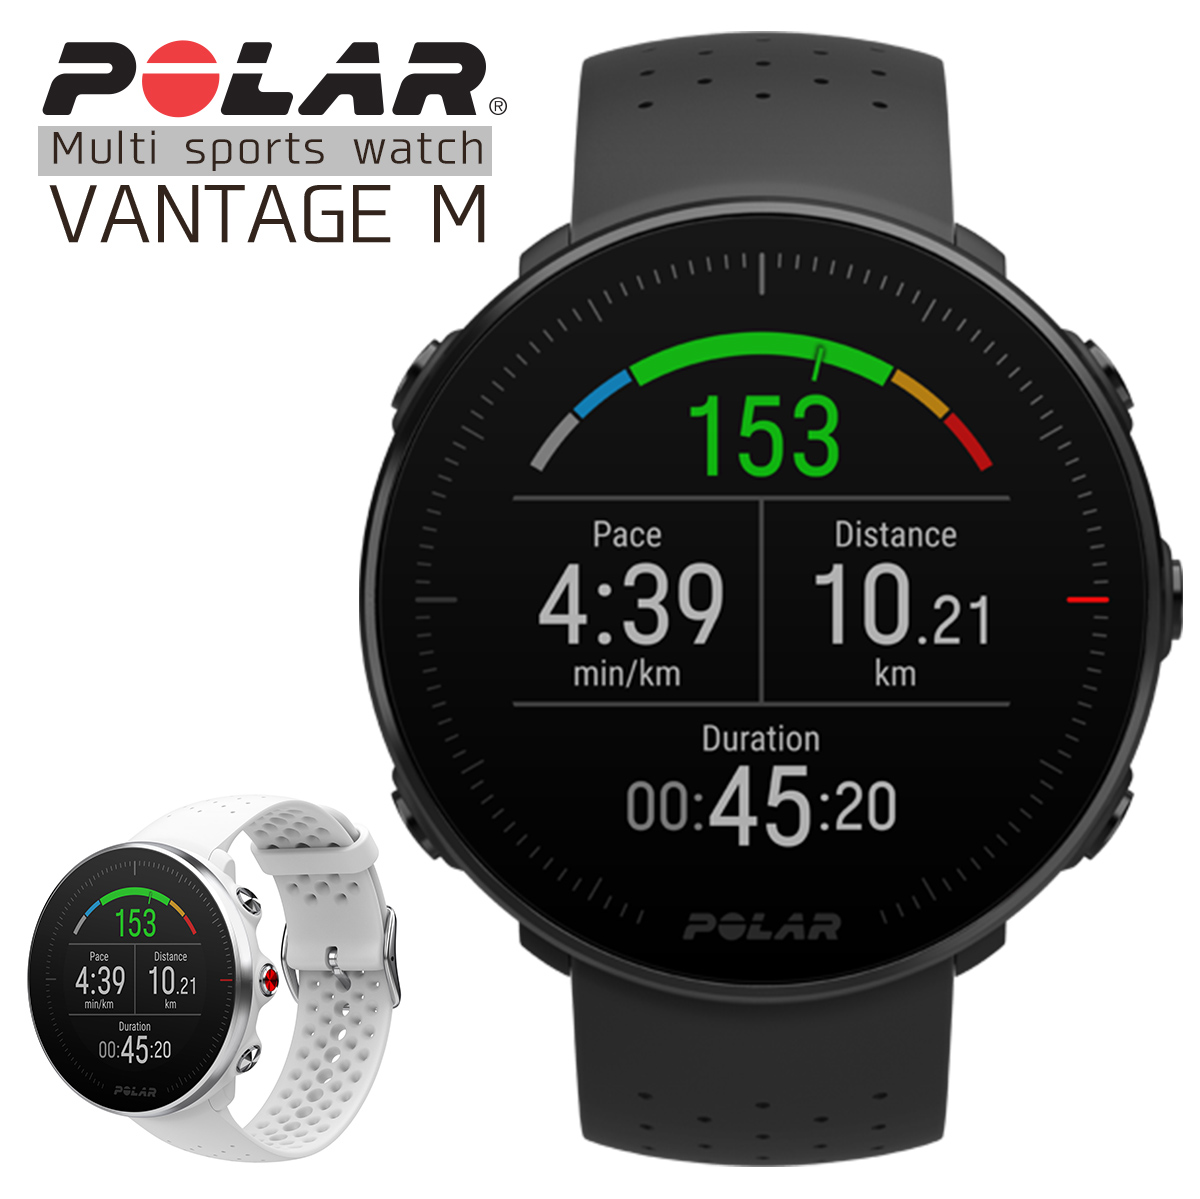 POLAR ポラール Polar Vantage M マルチスポーツウォッチ GPSランニングウォッチ 心拍数 腕時計タイプ 国内正規品 スマートウォッチ